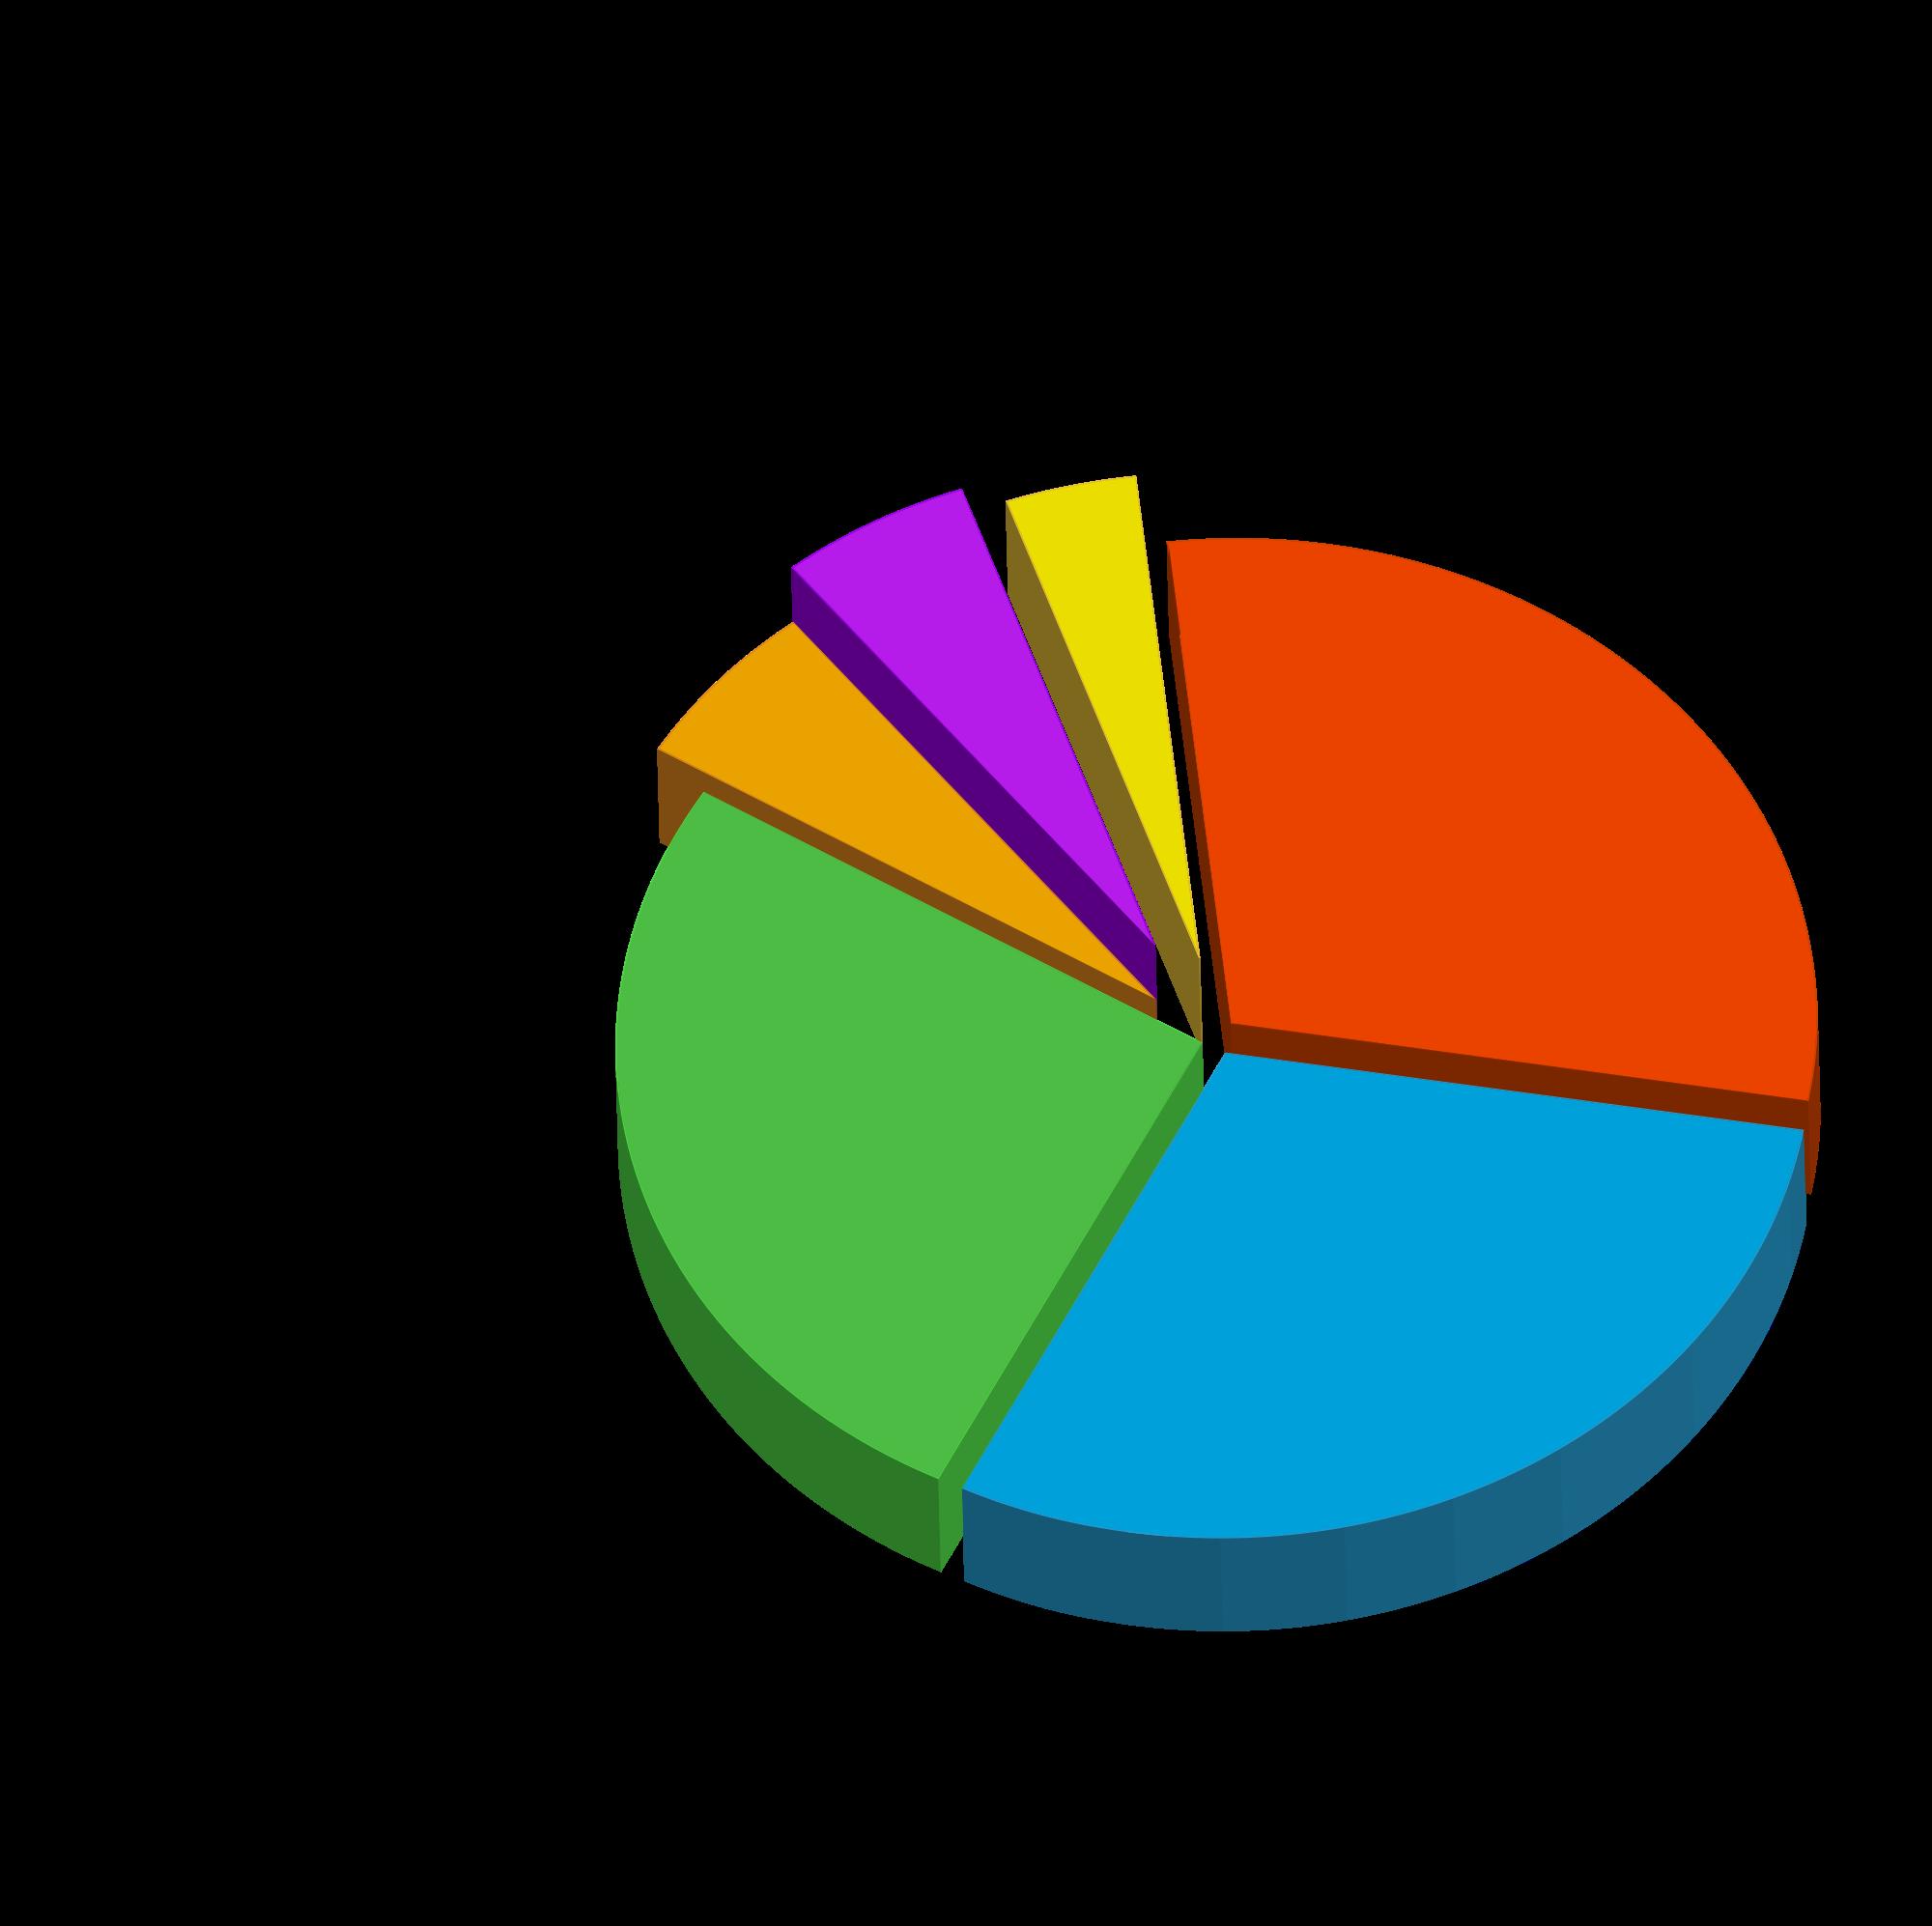 File origins of piechart. English clipart english word